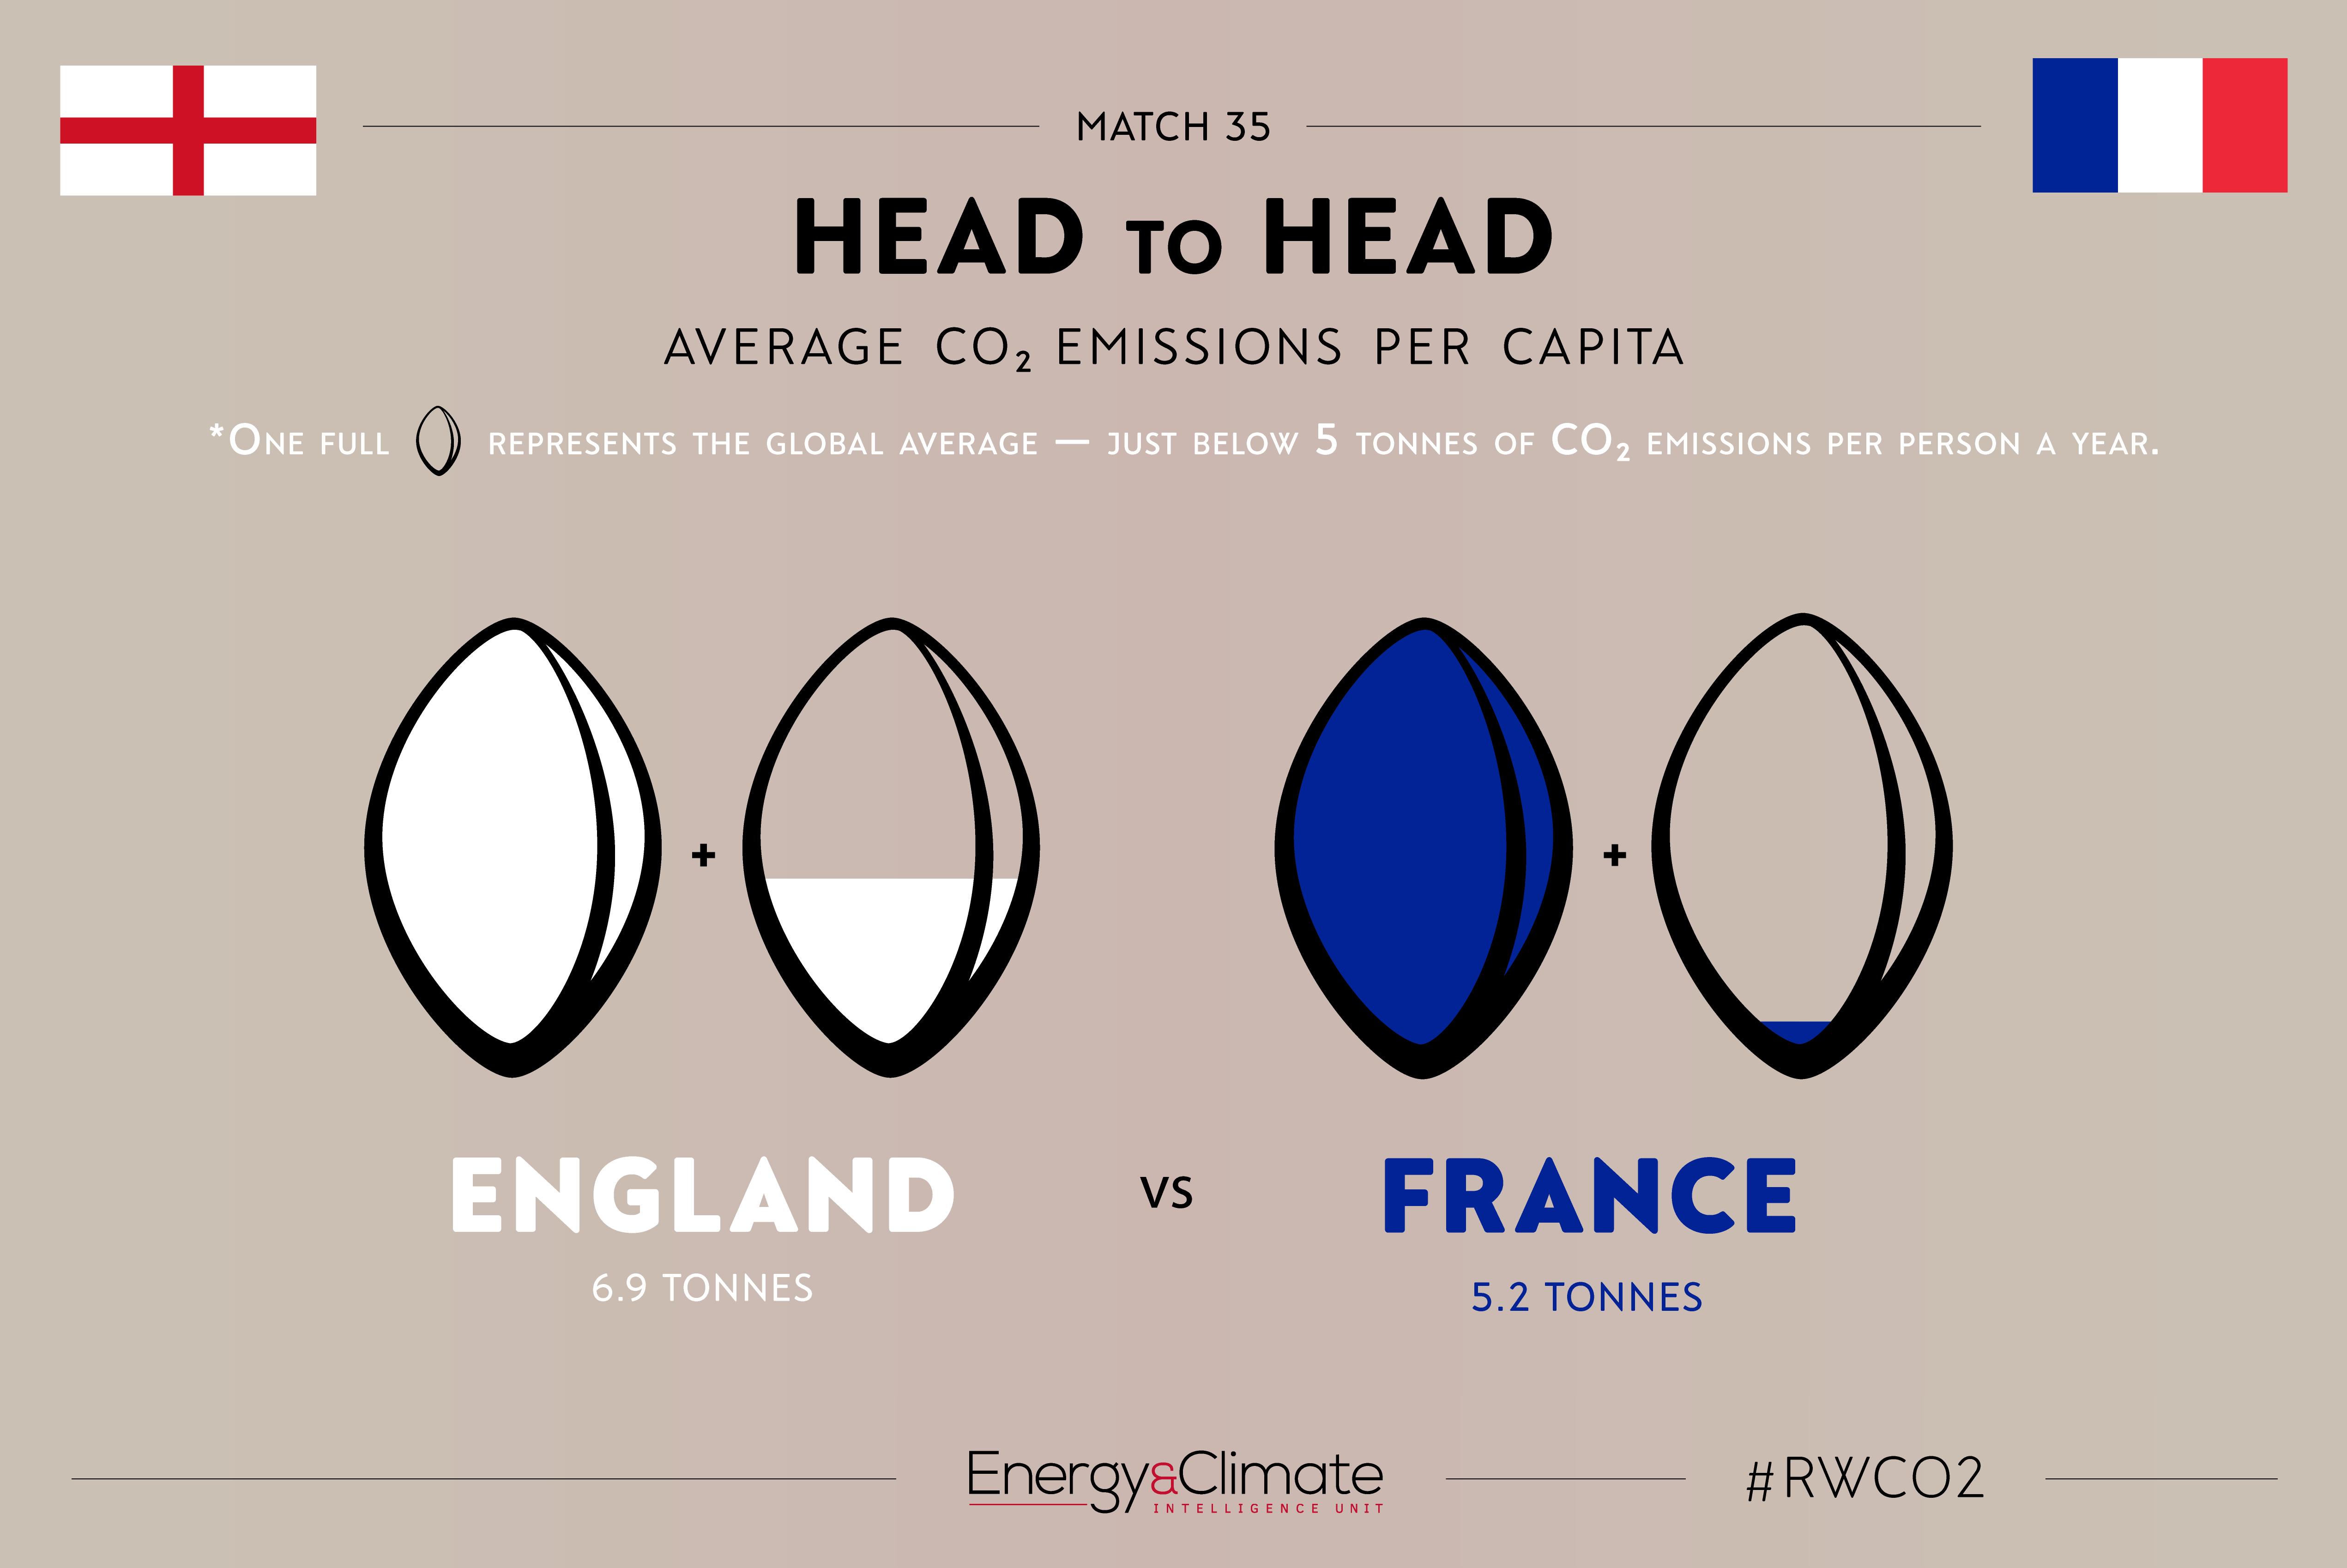 England v France - per capita emissions